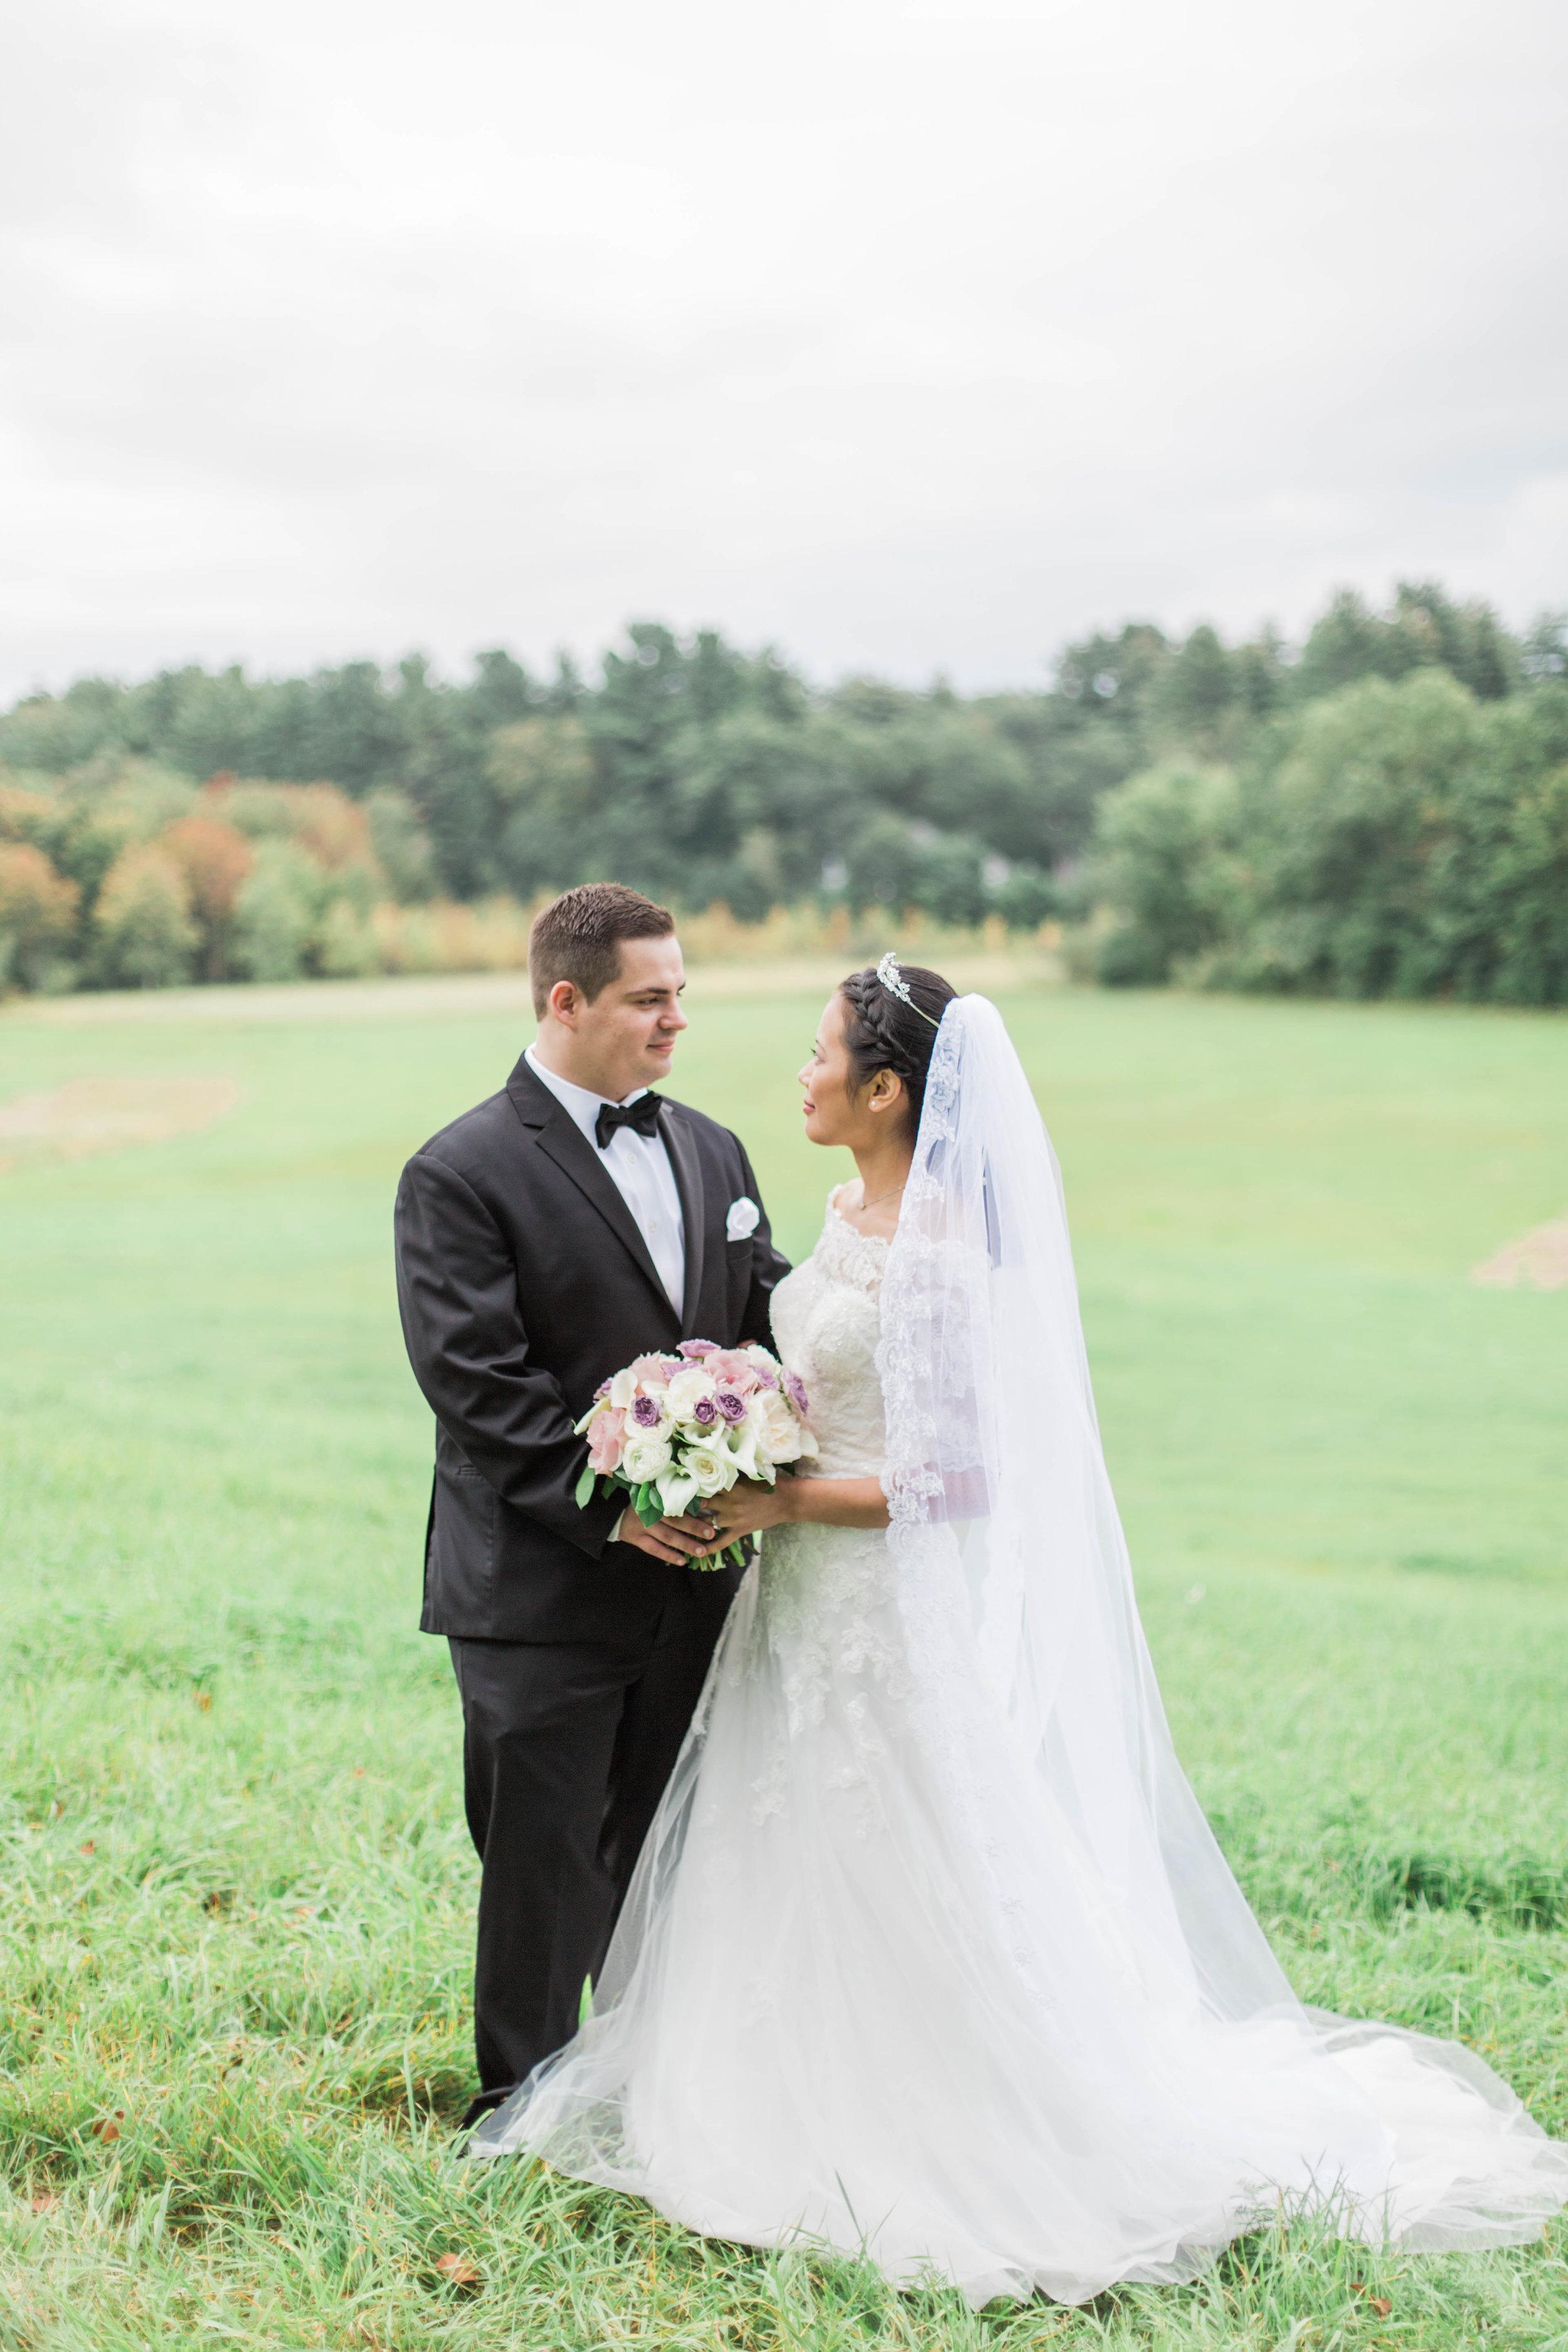 ZachAndCrystal_Wedding-174.jpg